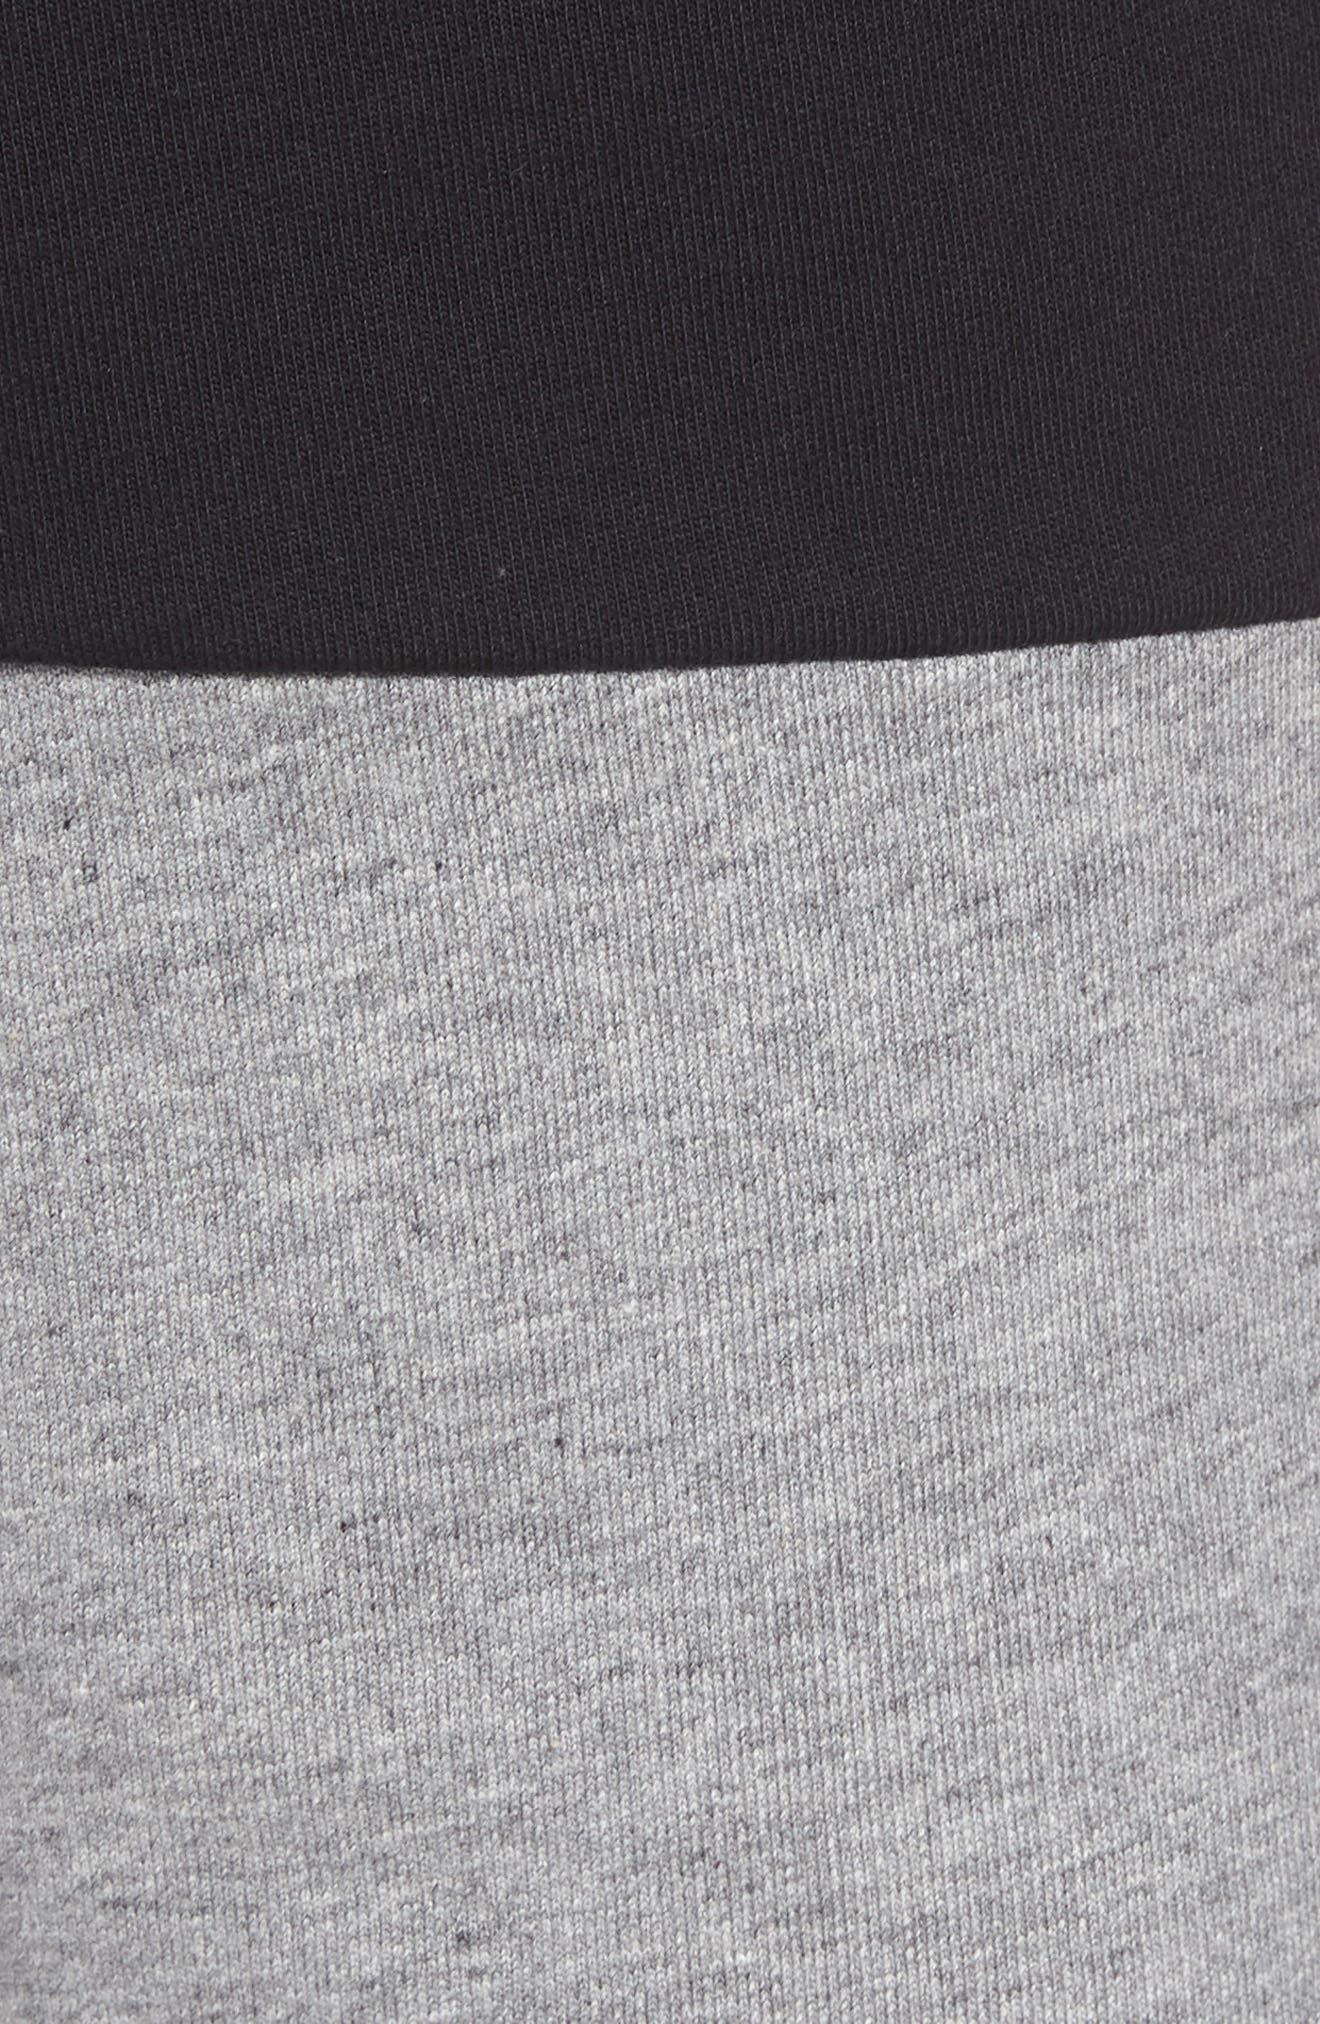 NSW Franchise GX3 Shorts,                             Alternate thumbnail 5, color,                             BLACK/ CARBON HEATHER/ WHITE